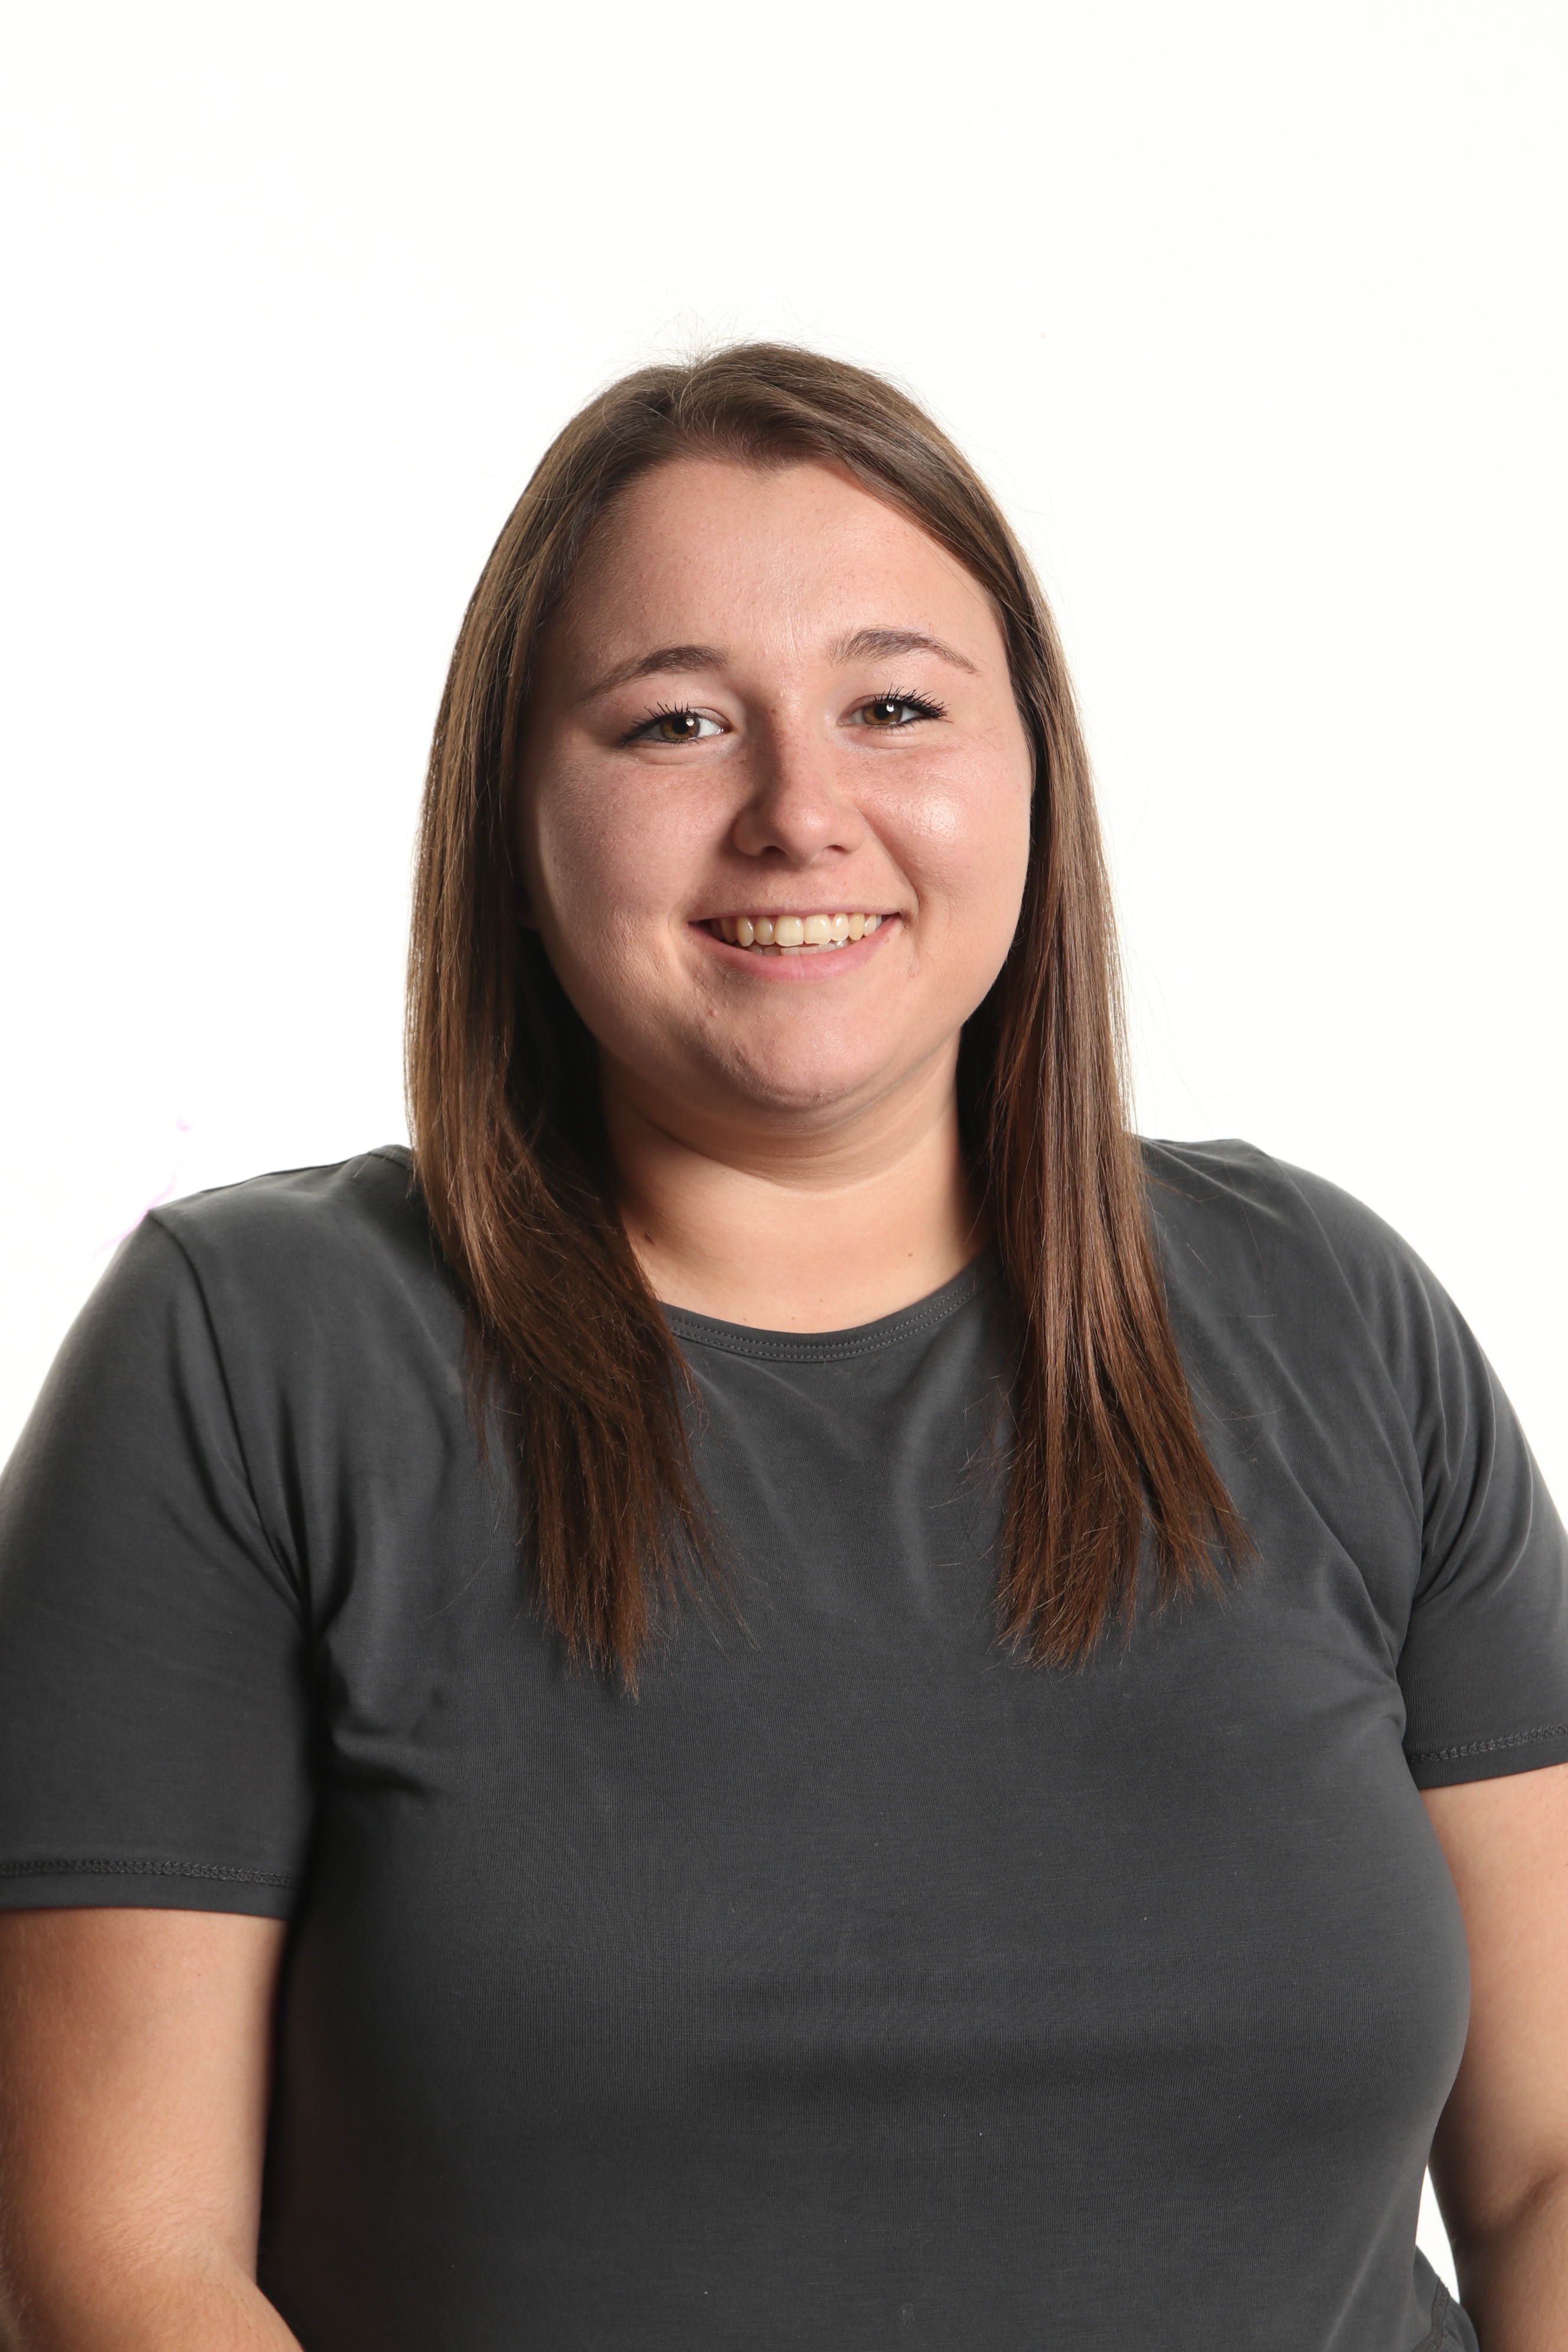 Kaitlyn Palmer